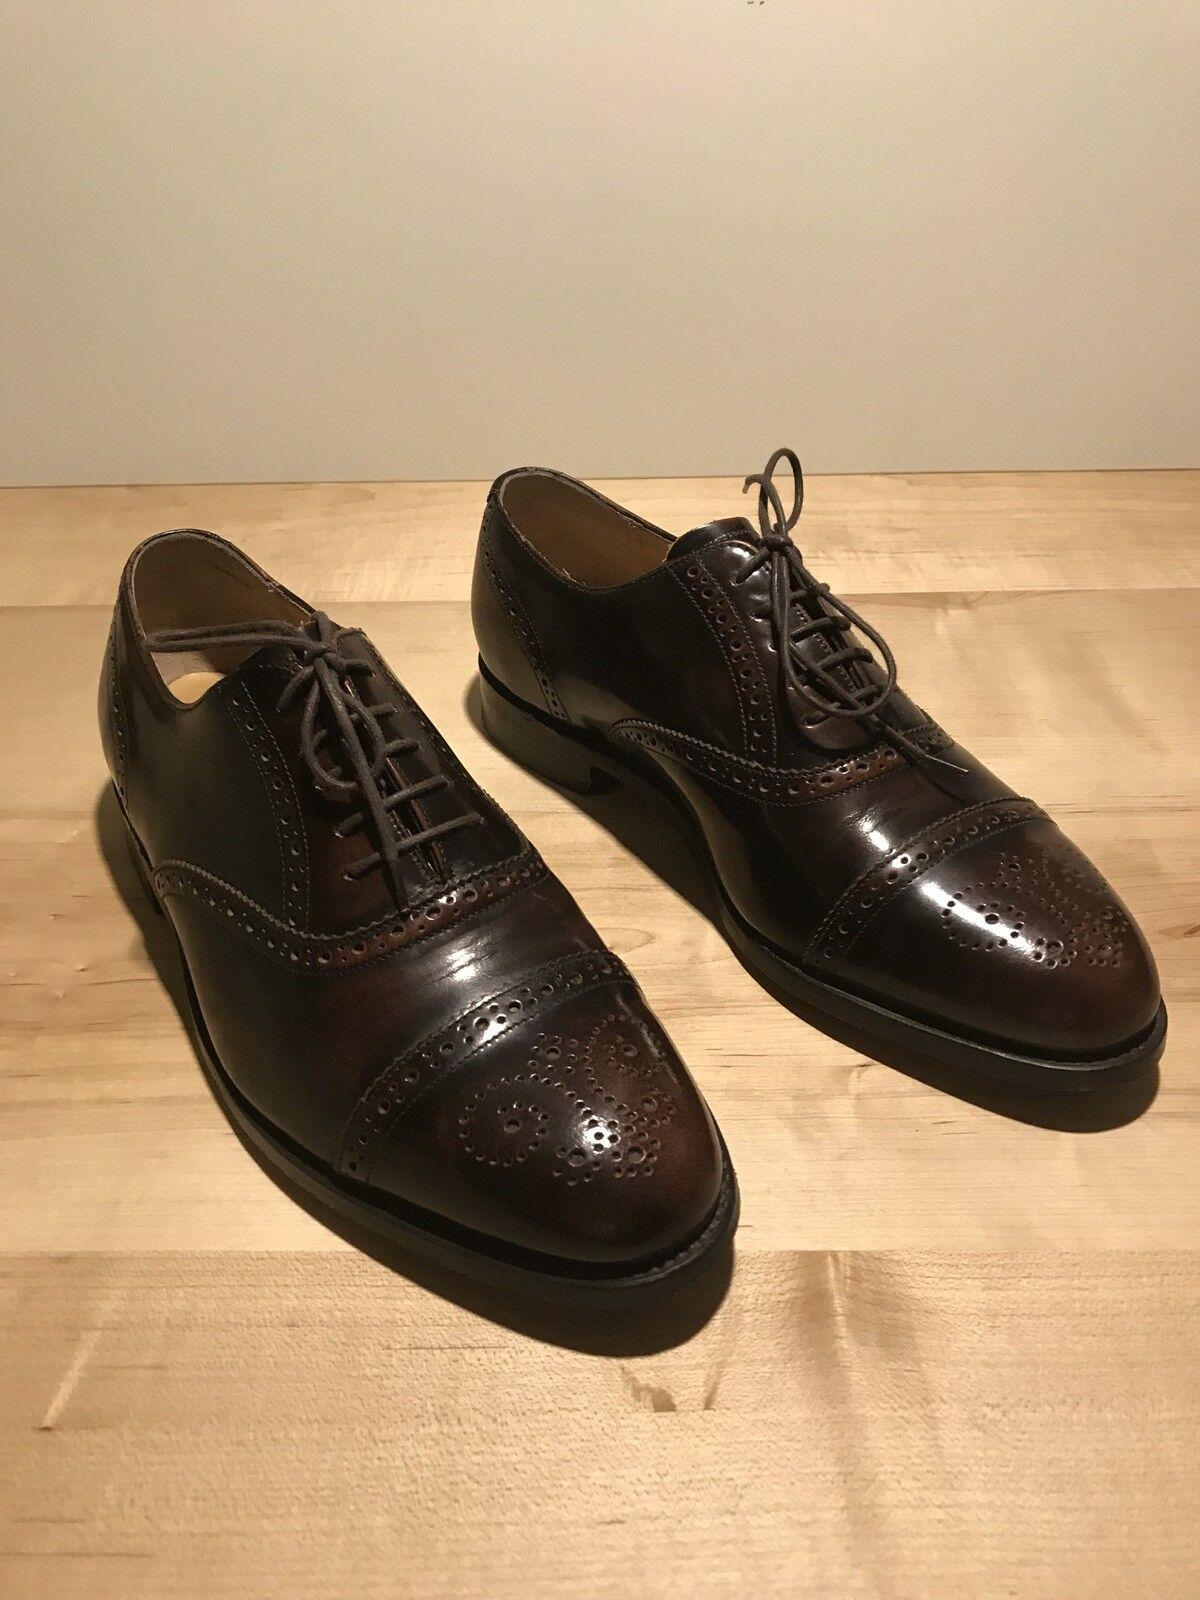 Barker Schuhes Schuhe Herren Budapester Gr.42 Halbschuh Schnürschuh Herrenschuh